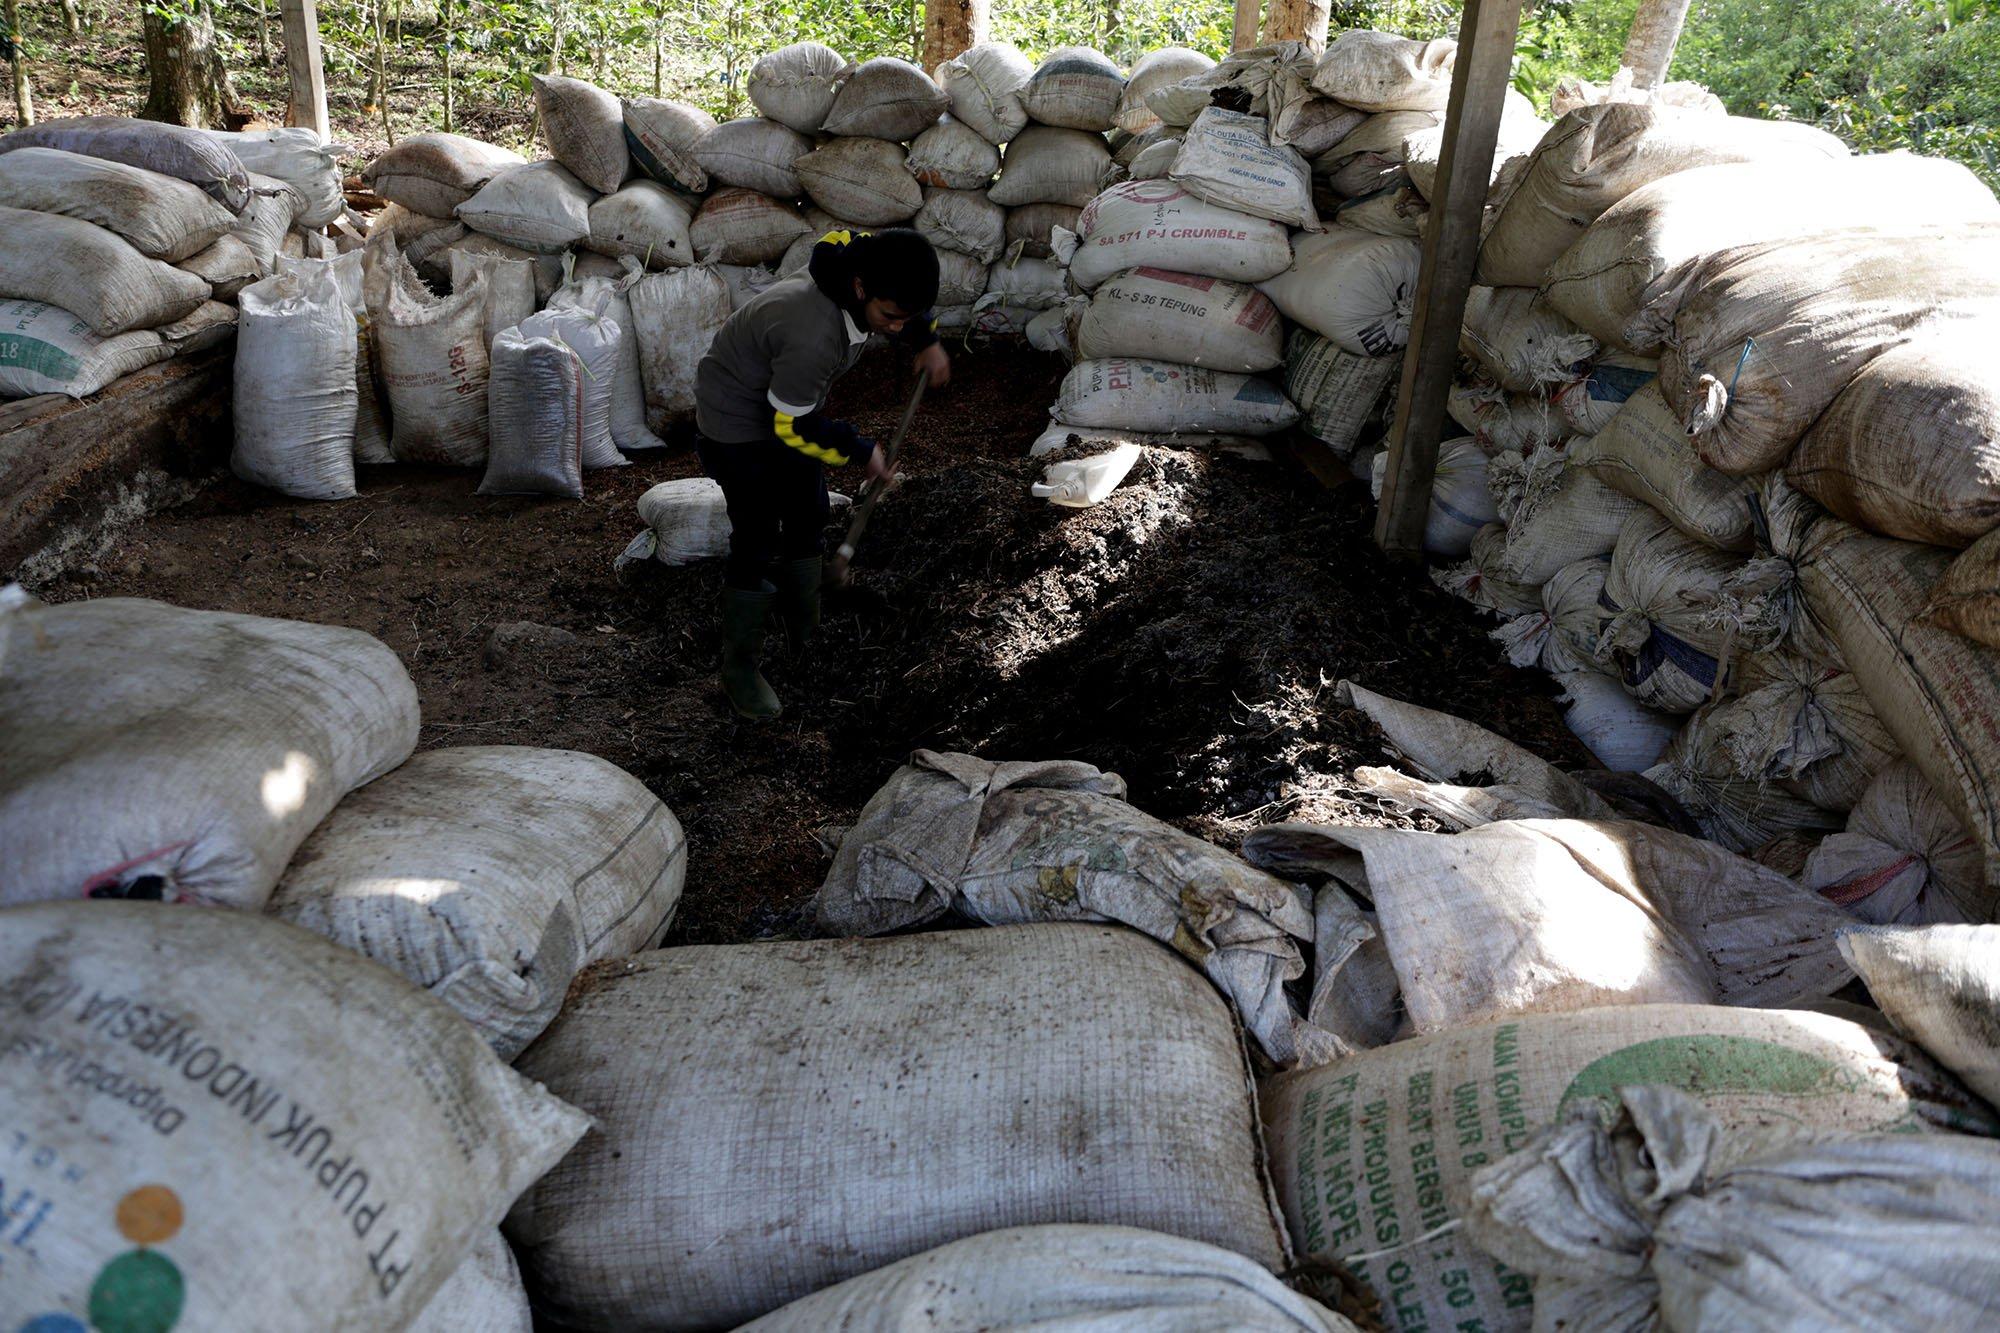 Pupuk merupakan faktor penentu kualitas kopi. Di perkebunan Mountain Malabar Coffee, pupuk organik dibuat sendiri (15/11/2019).